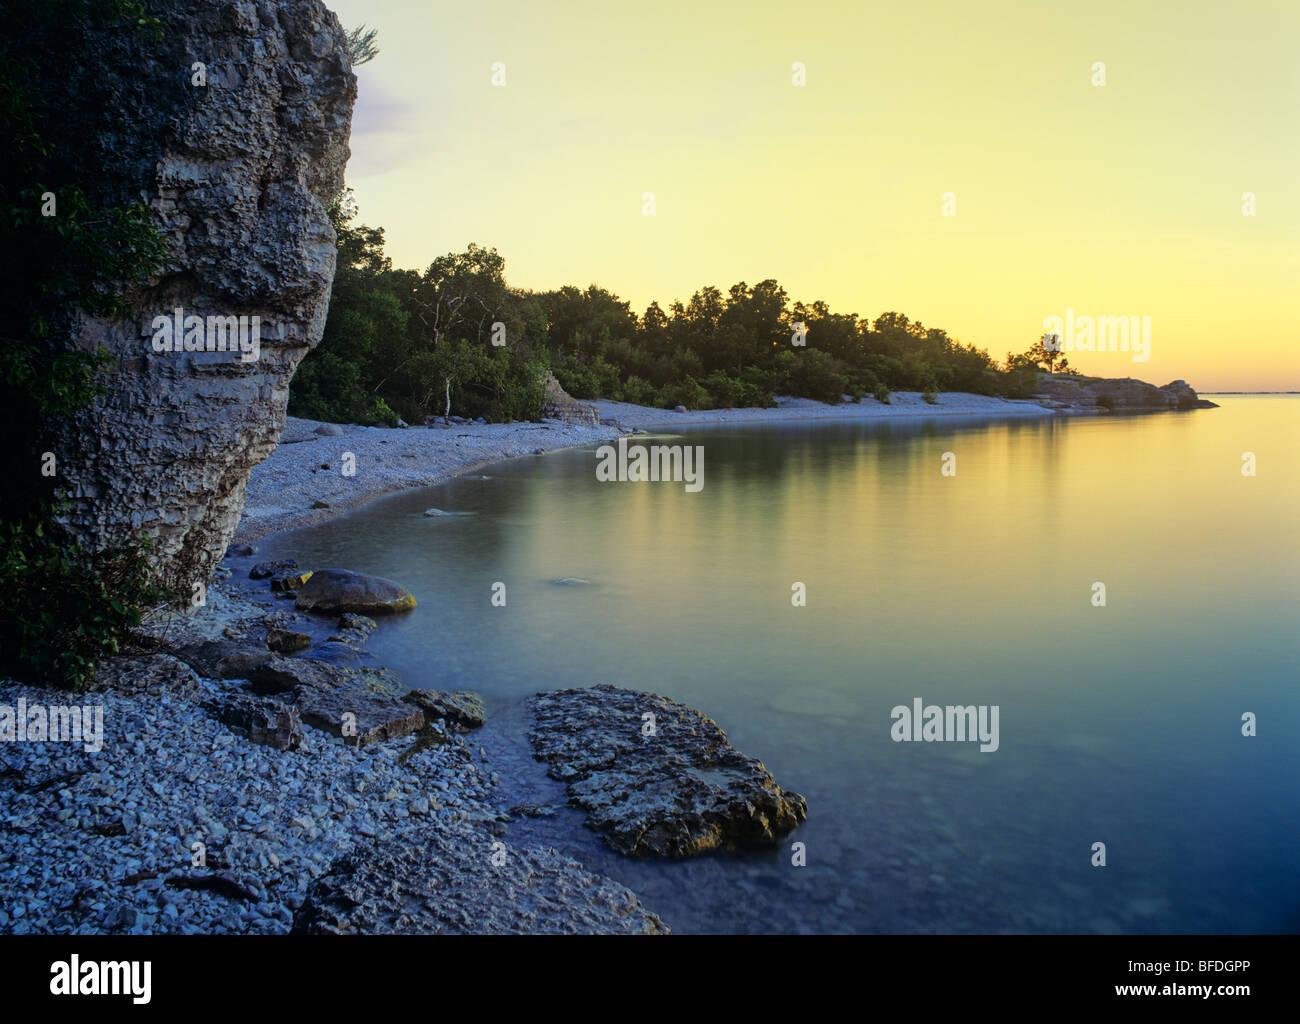 Sunrise at Steep Rock Beach Park, Manitoba, Canada - Stock Image